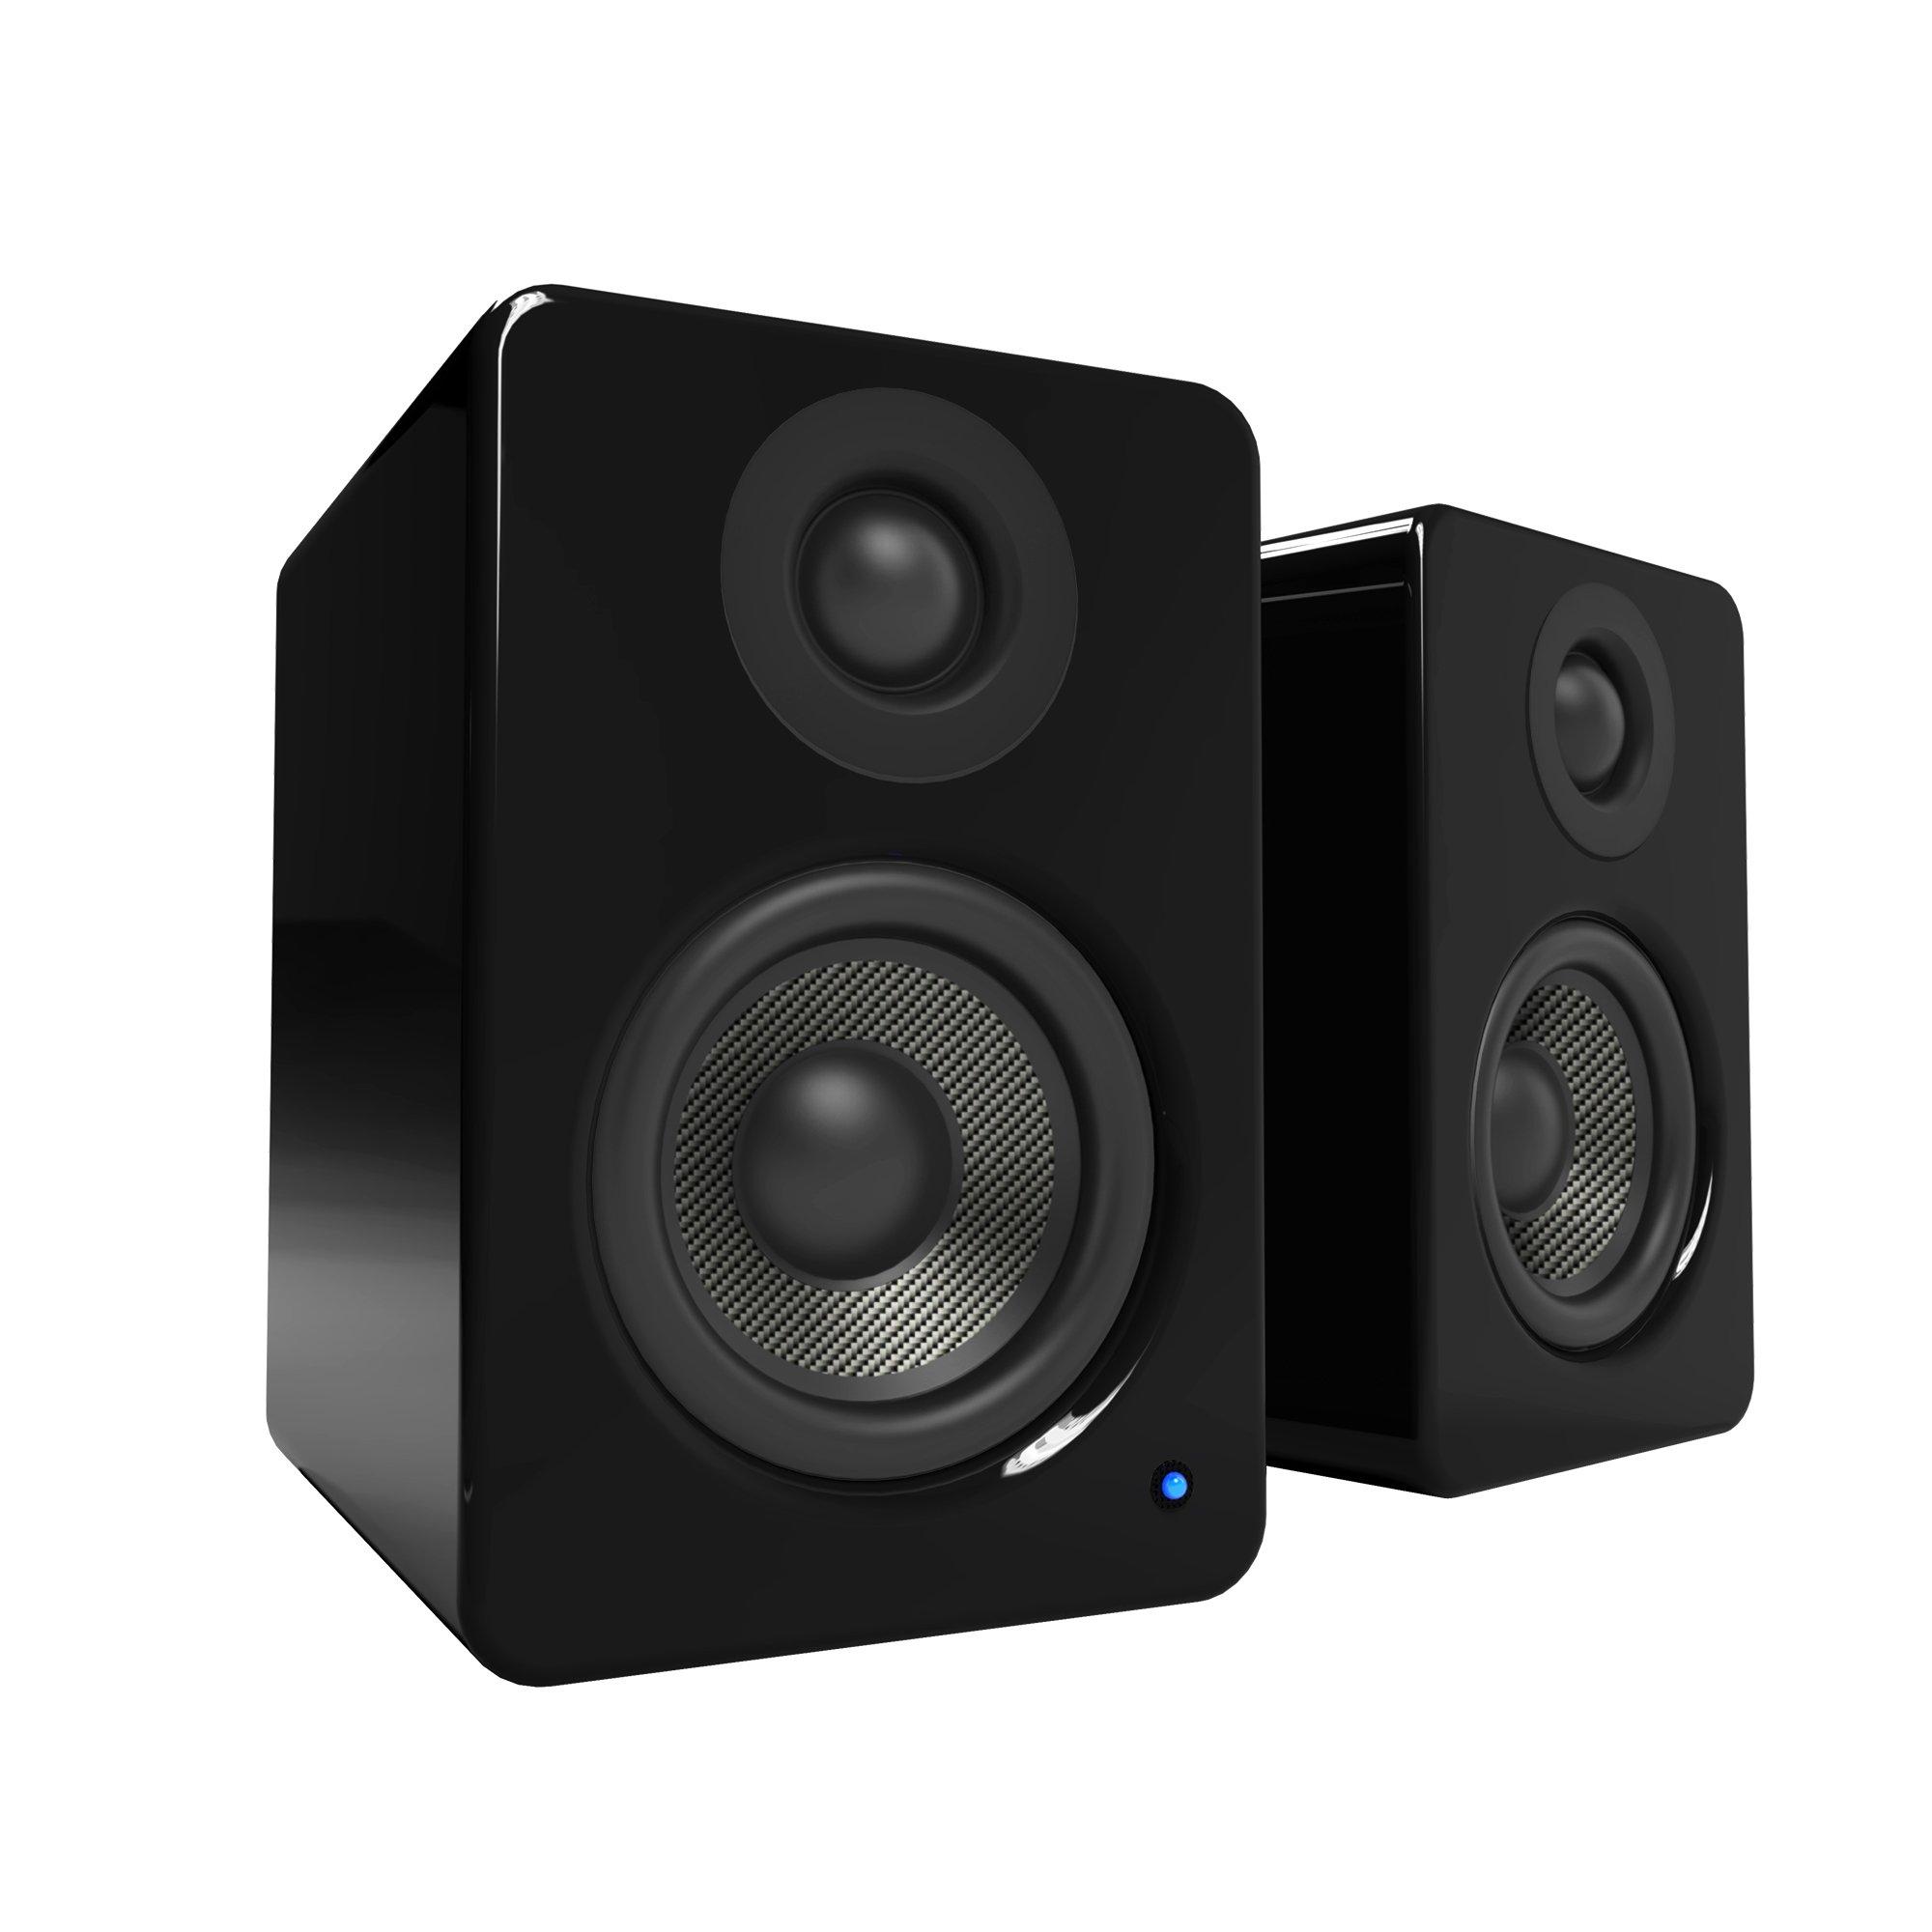 Kanto YU2 Powered Desktop Speakers – 3'' Composite Driver 3/4'' Silk Dome Tweeter – Gloss Black